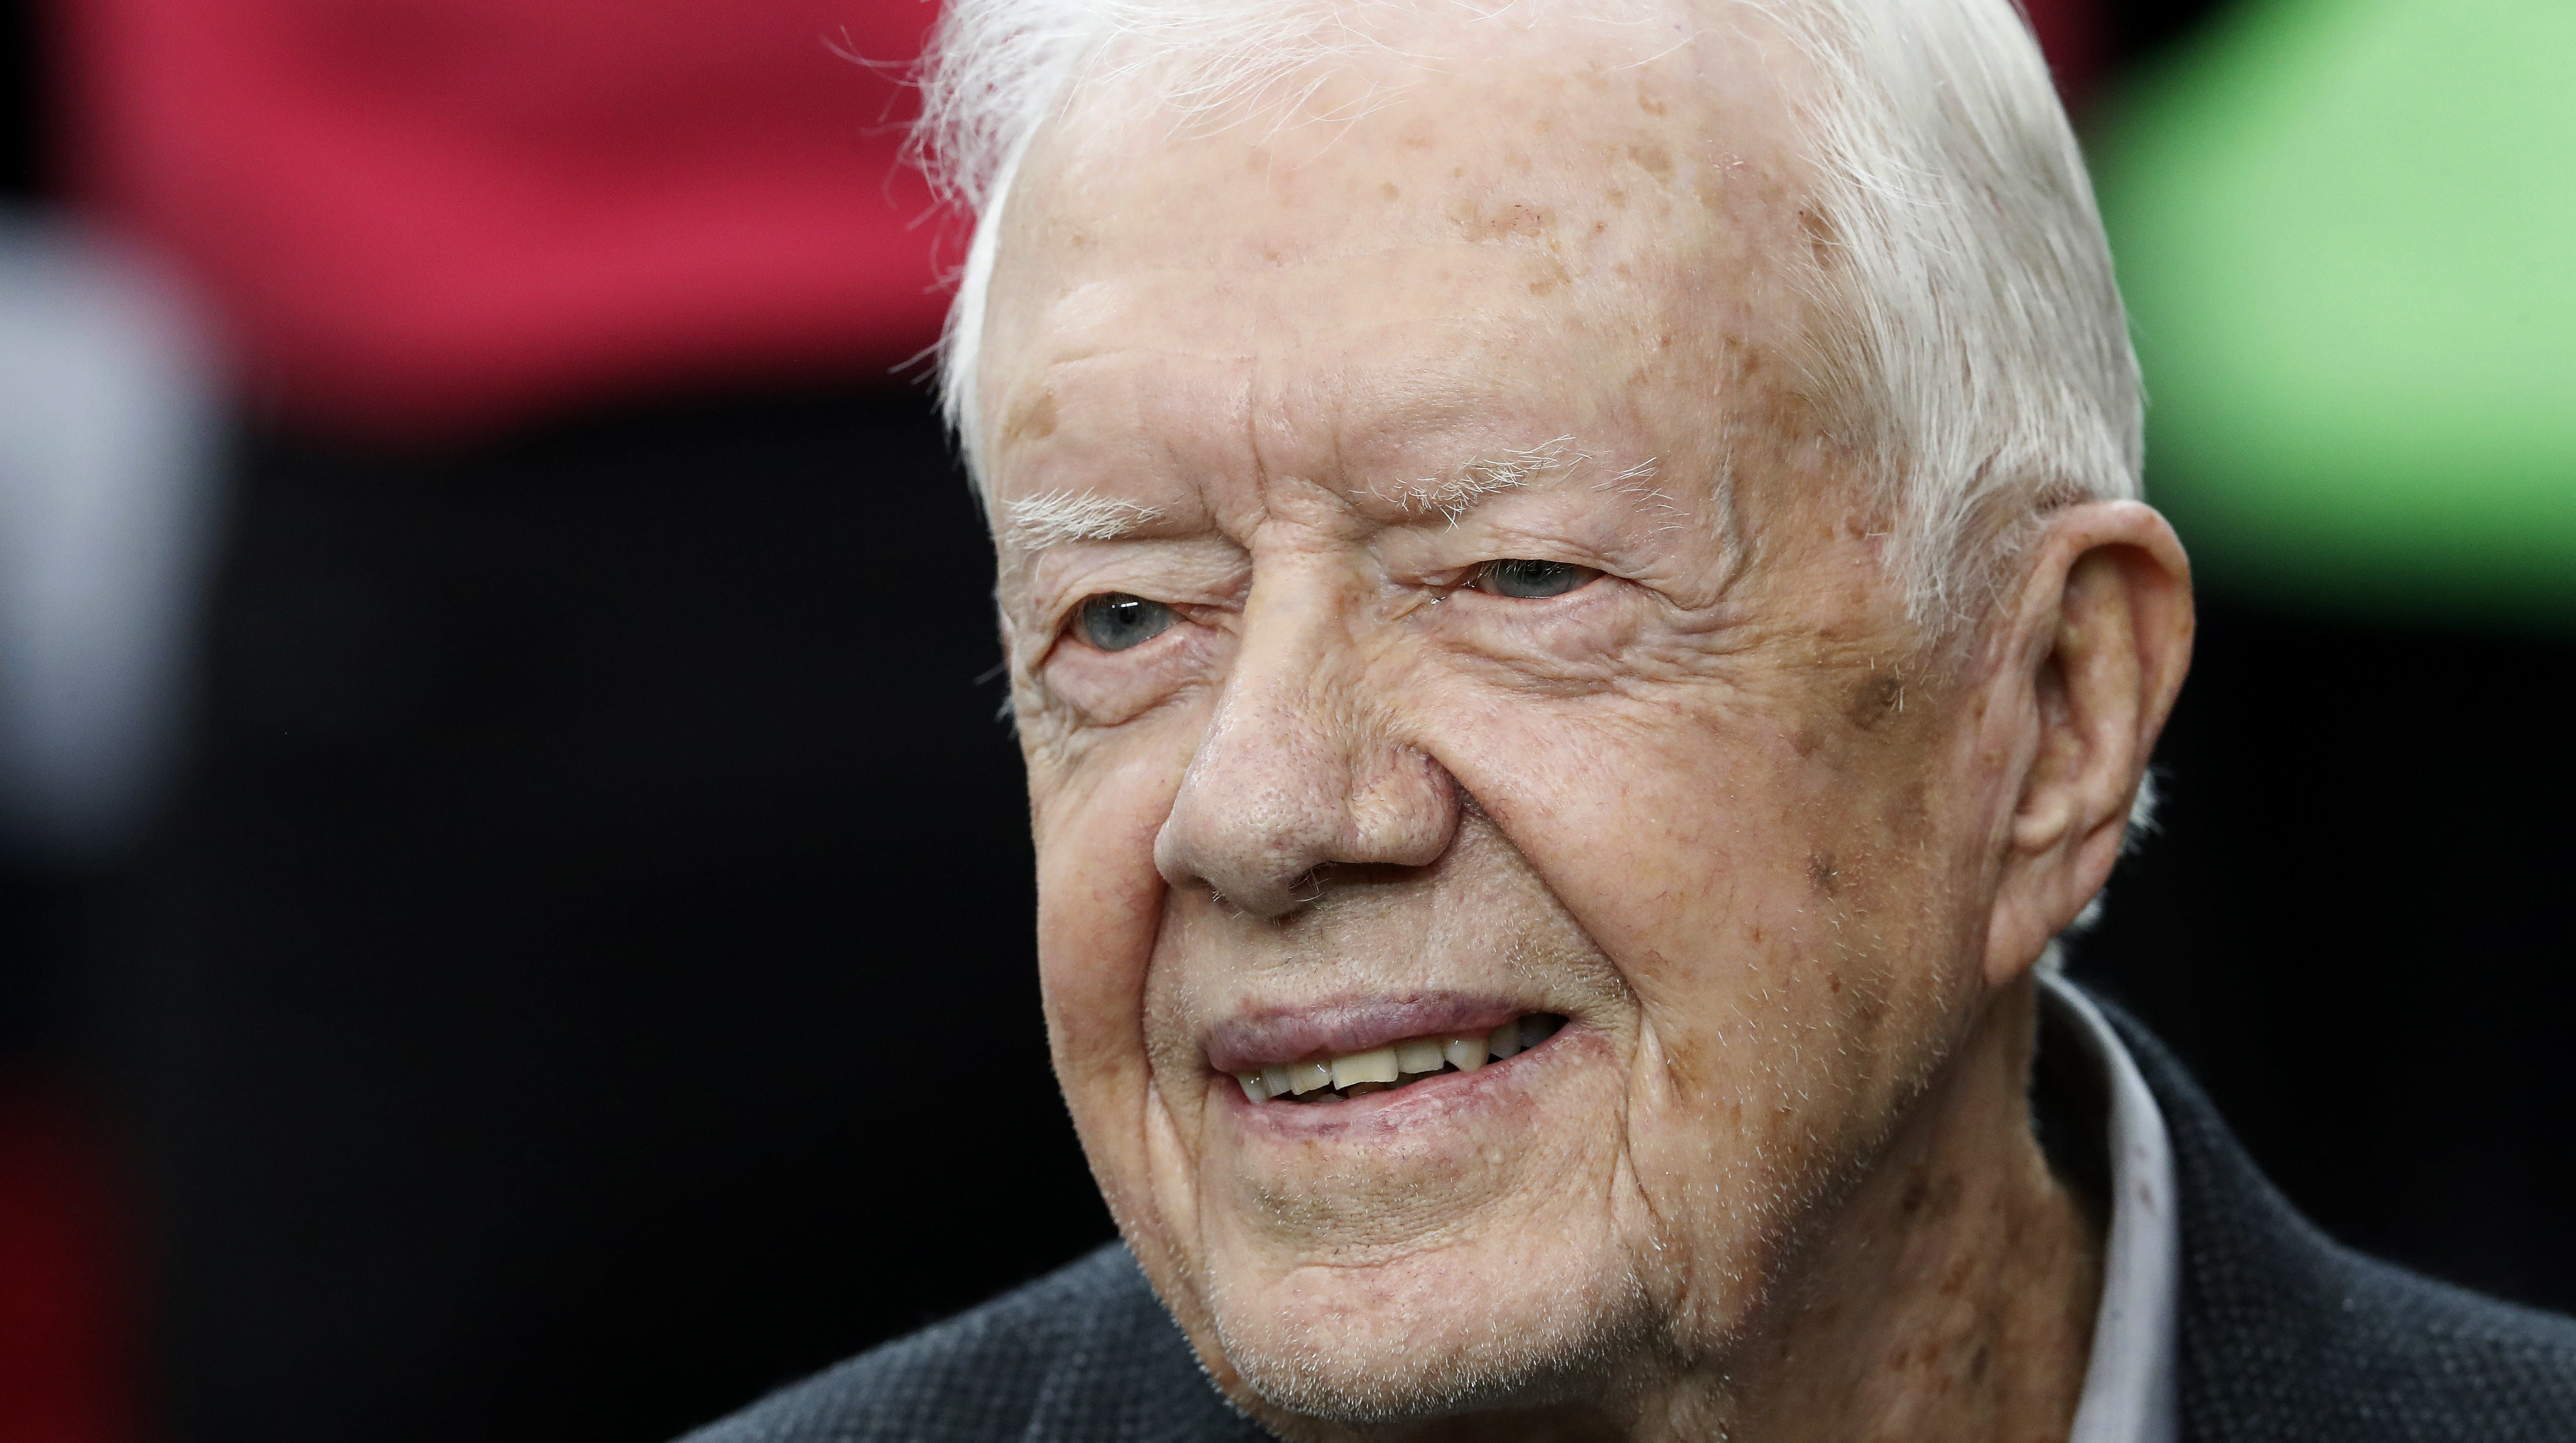 Jimmy Carter Says Brett Kavanaugh 'Unfit' To Serve As Supreme Court Justice